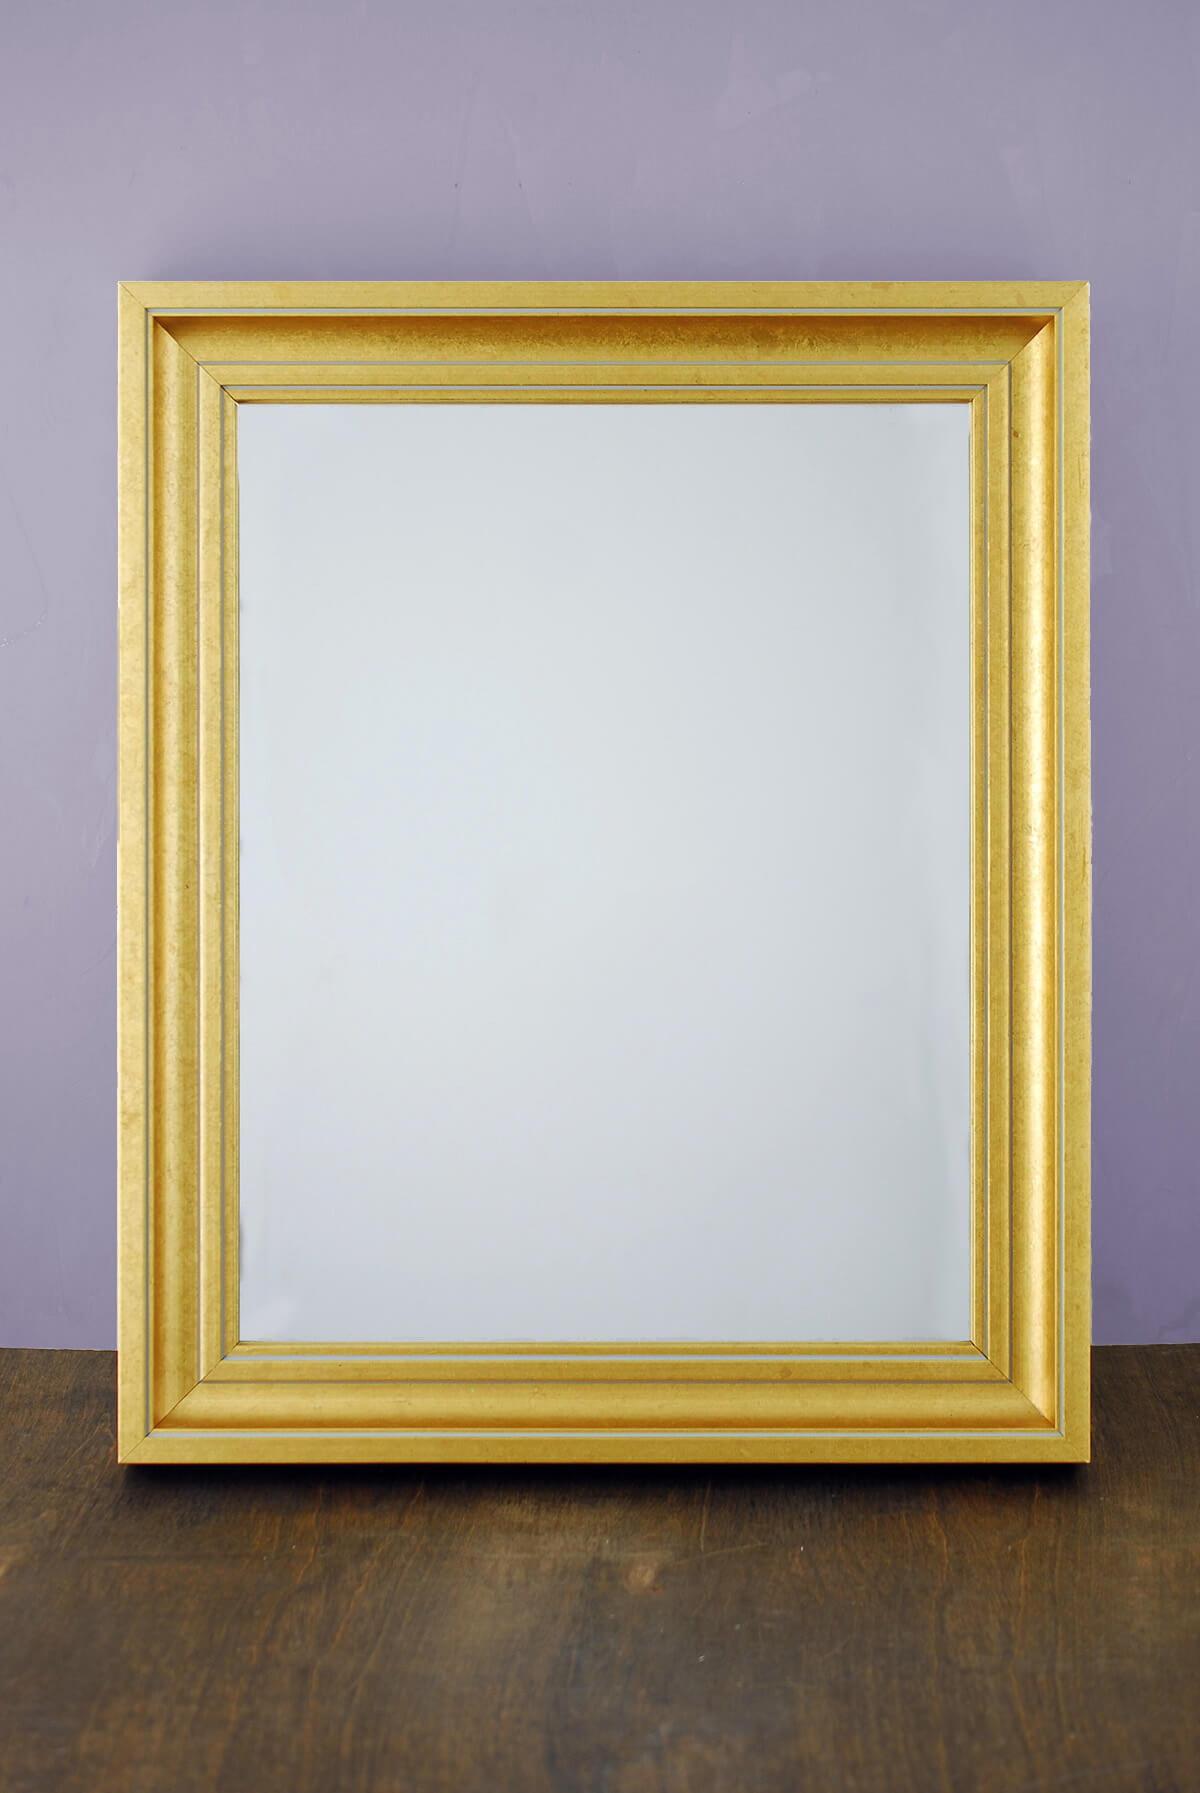 Framed Mirror Gold 11x14 - Walmart.com